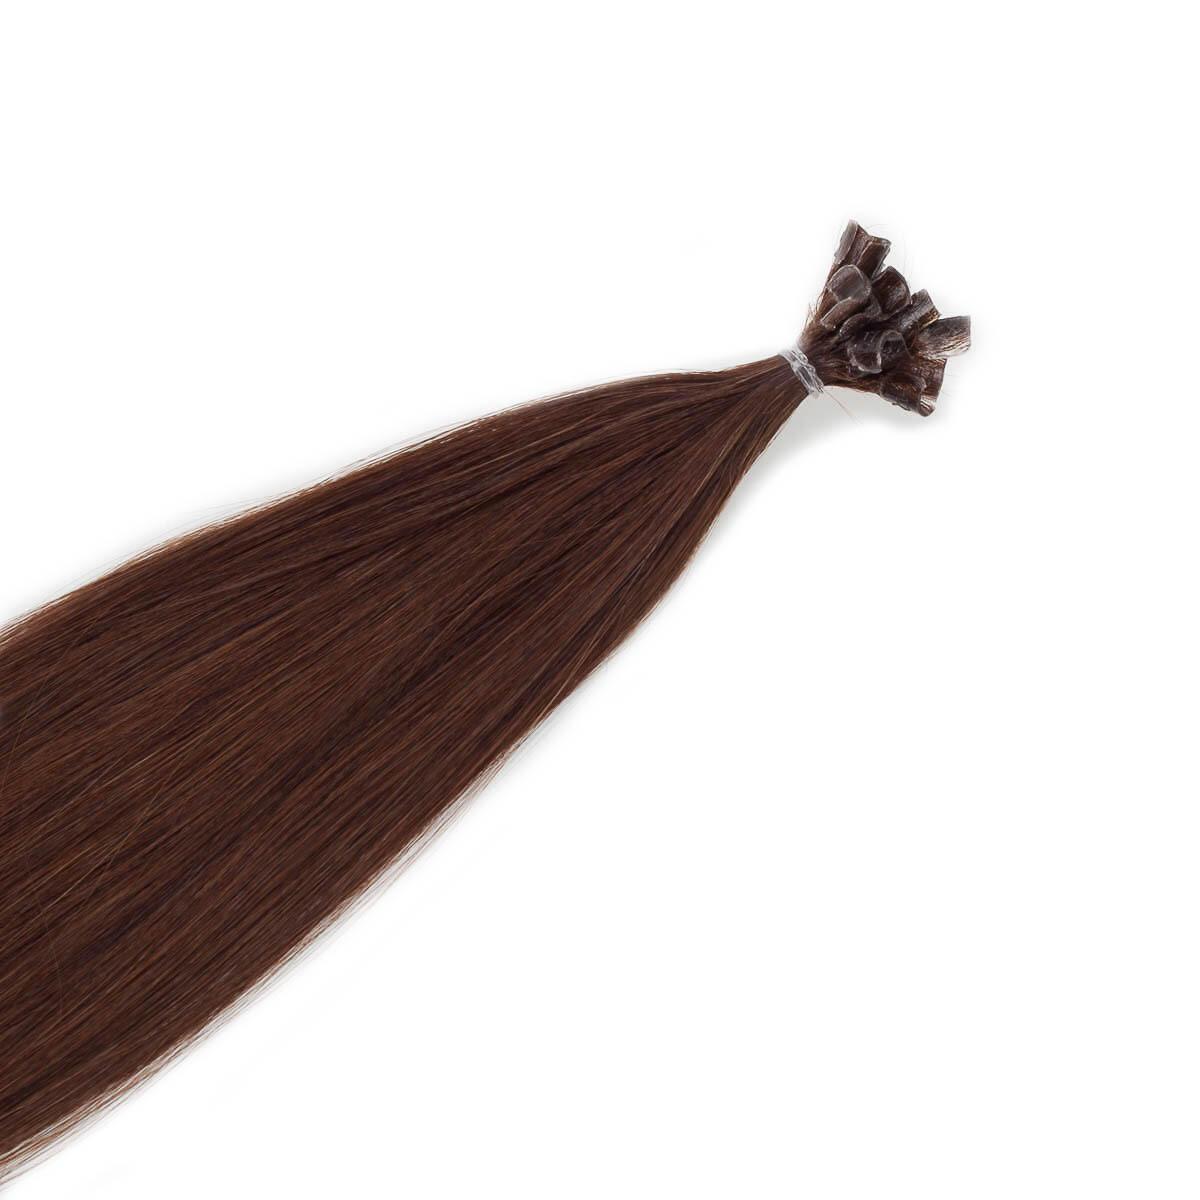 Bondings Premium Glatt 2.0 Dark Brown 60 cm